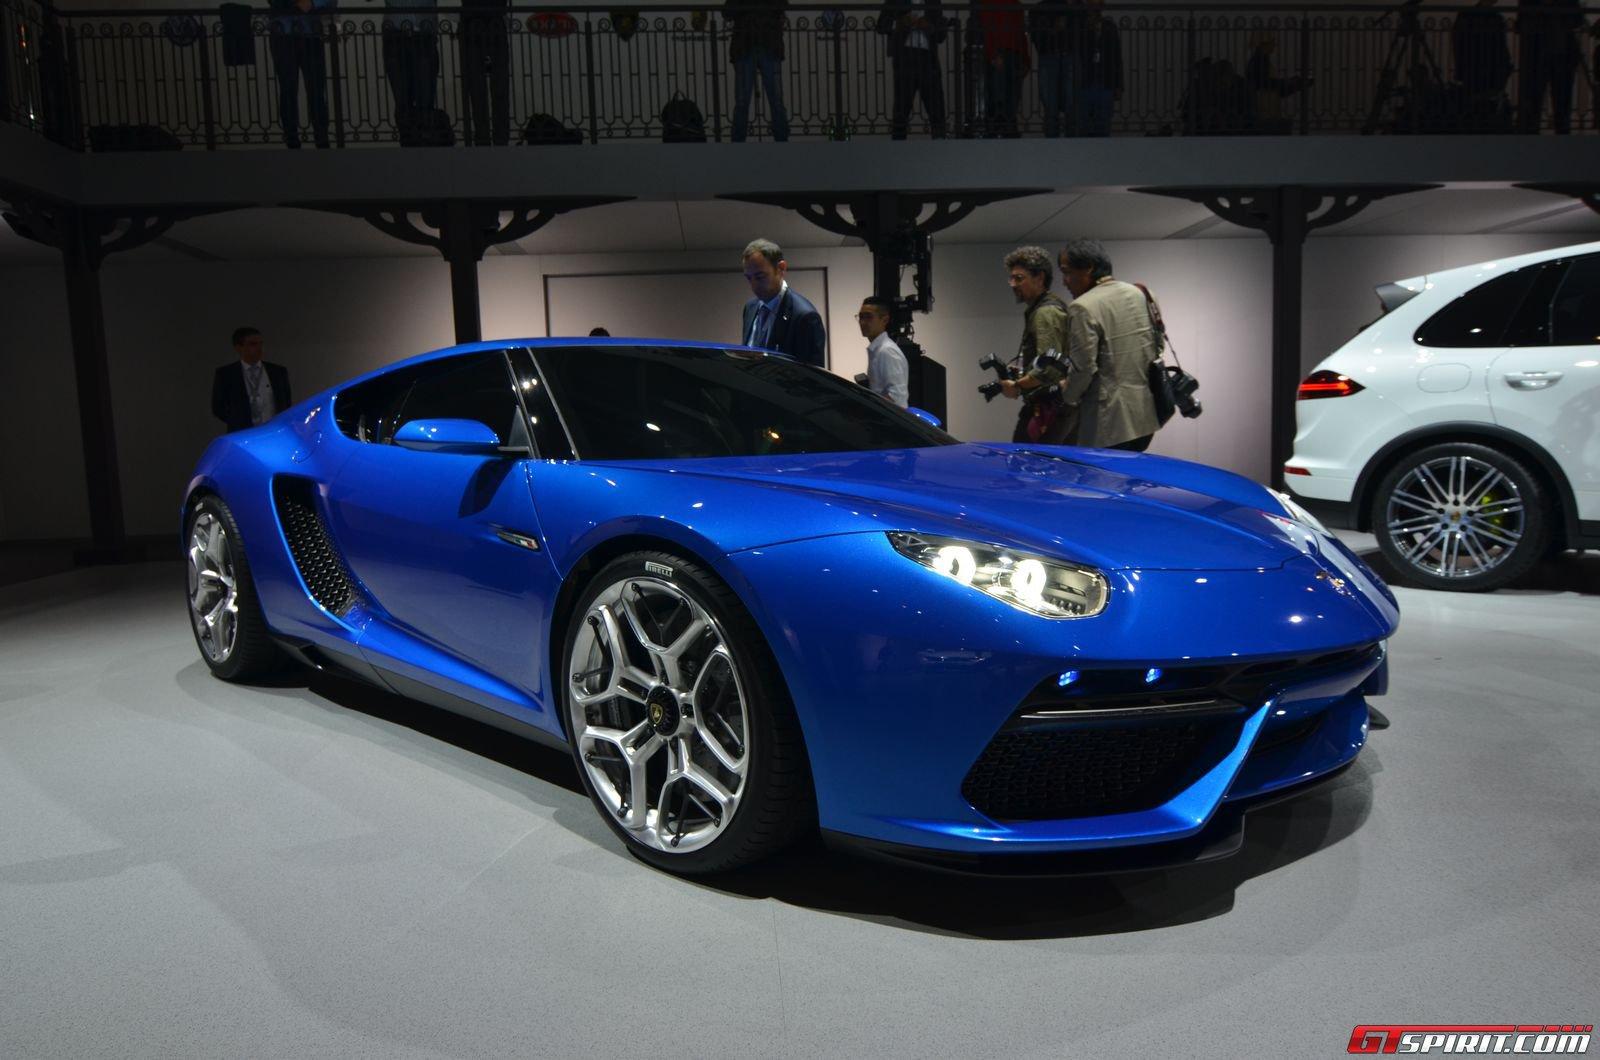 Lamborghini to Present the Asterion LP I910-4 at Villa d'Este 2015